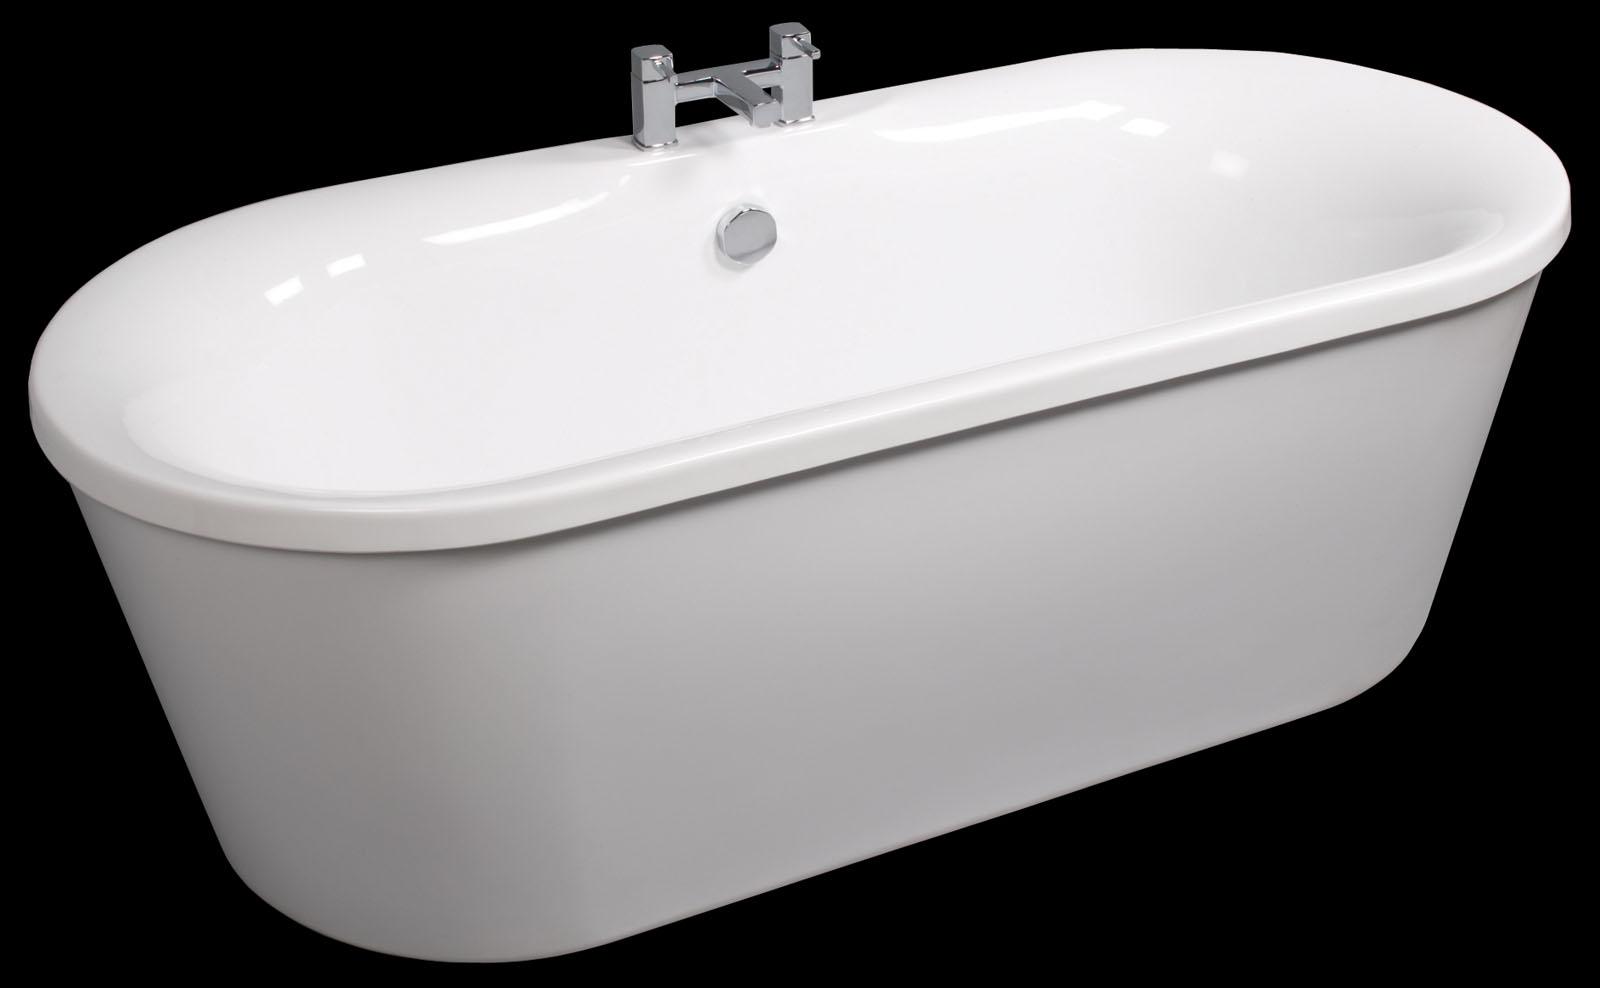 Vasca da bagno freestanding modello AUDREY